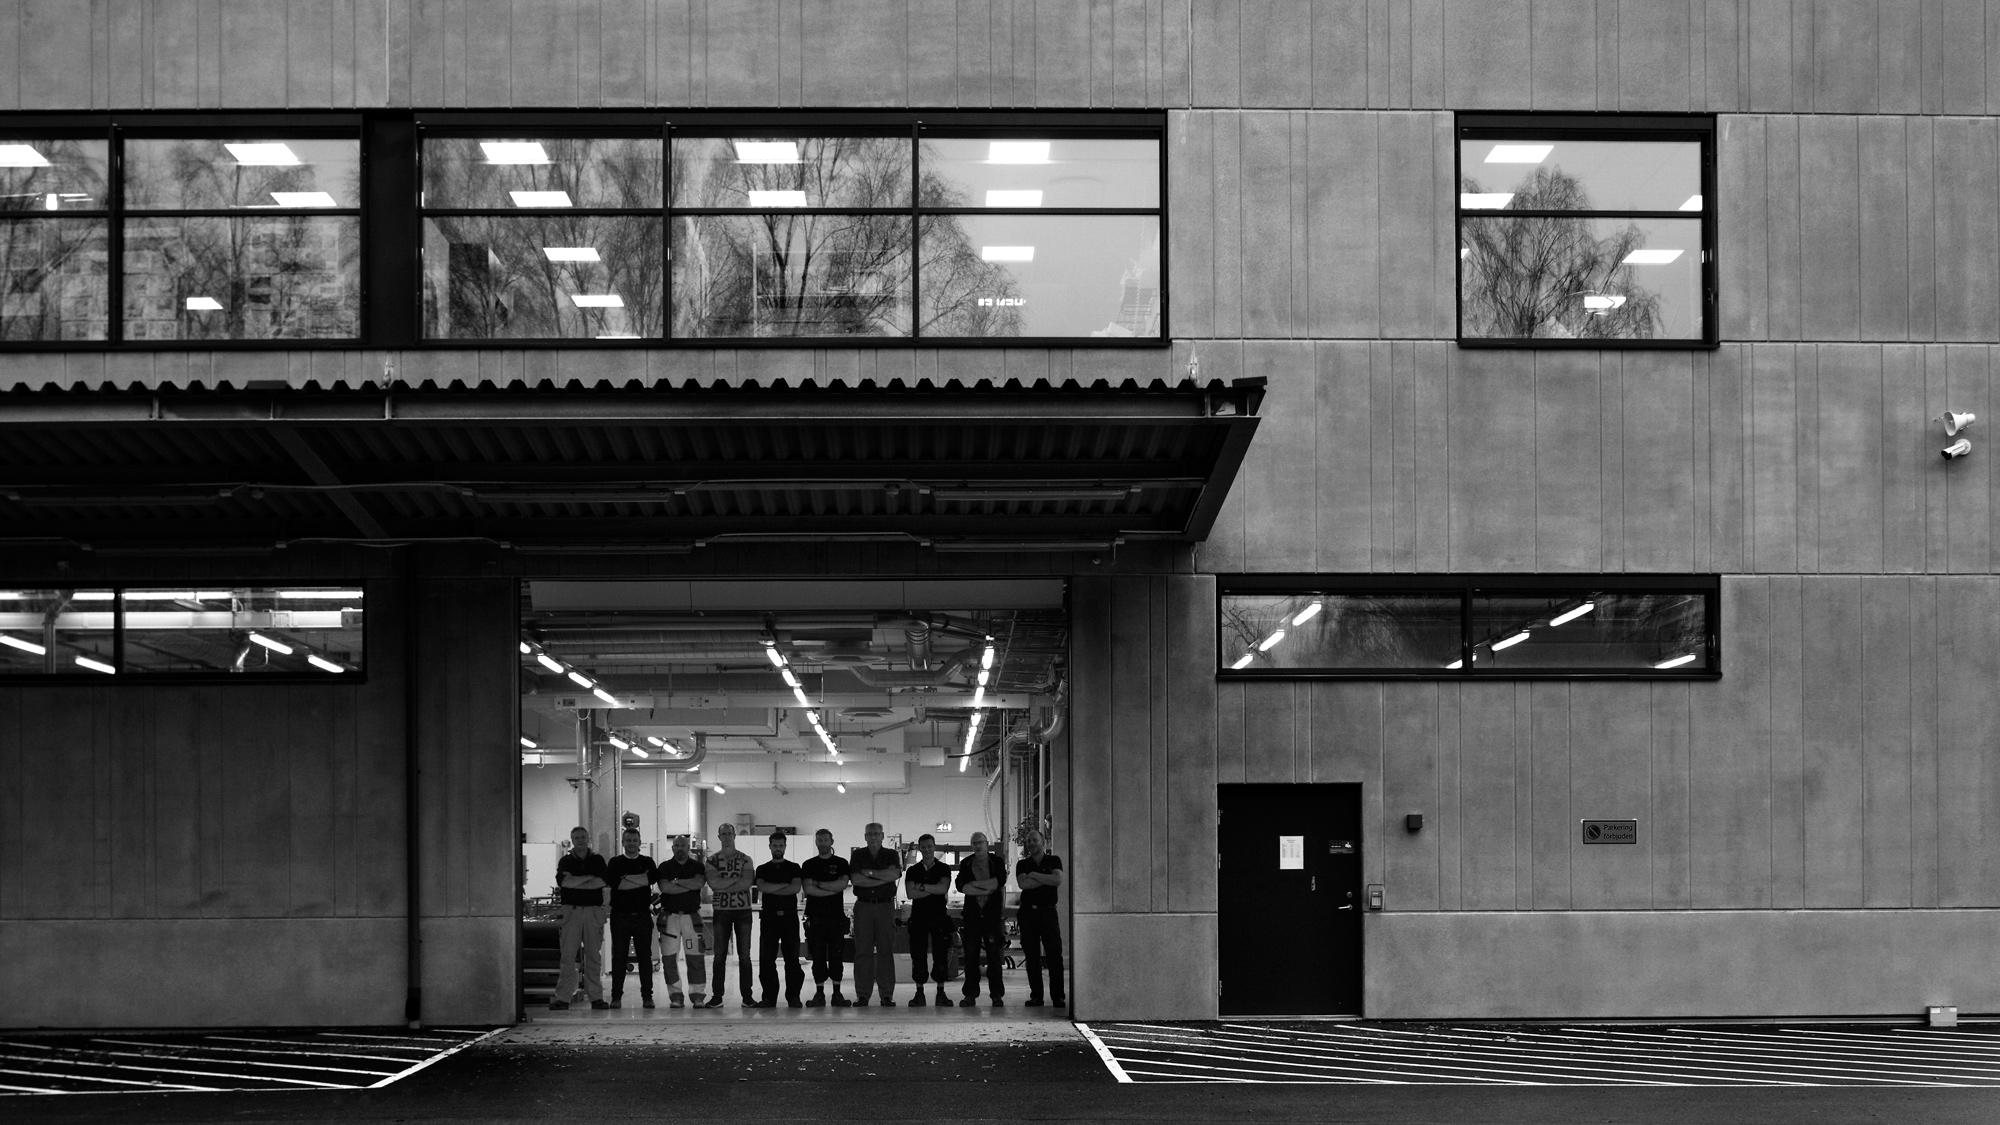 Ten men standing in an opening in the concrete facade of an industrial building.